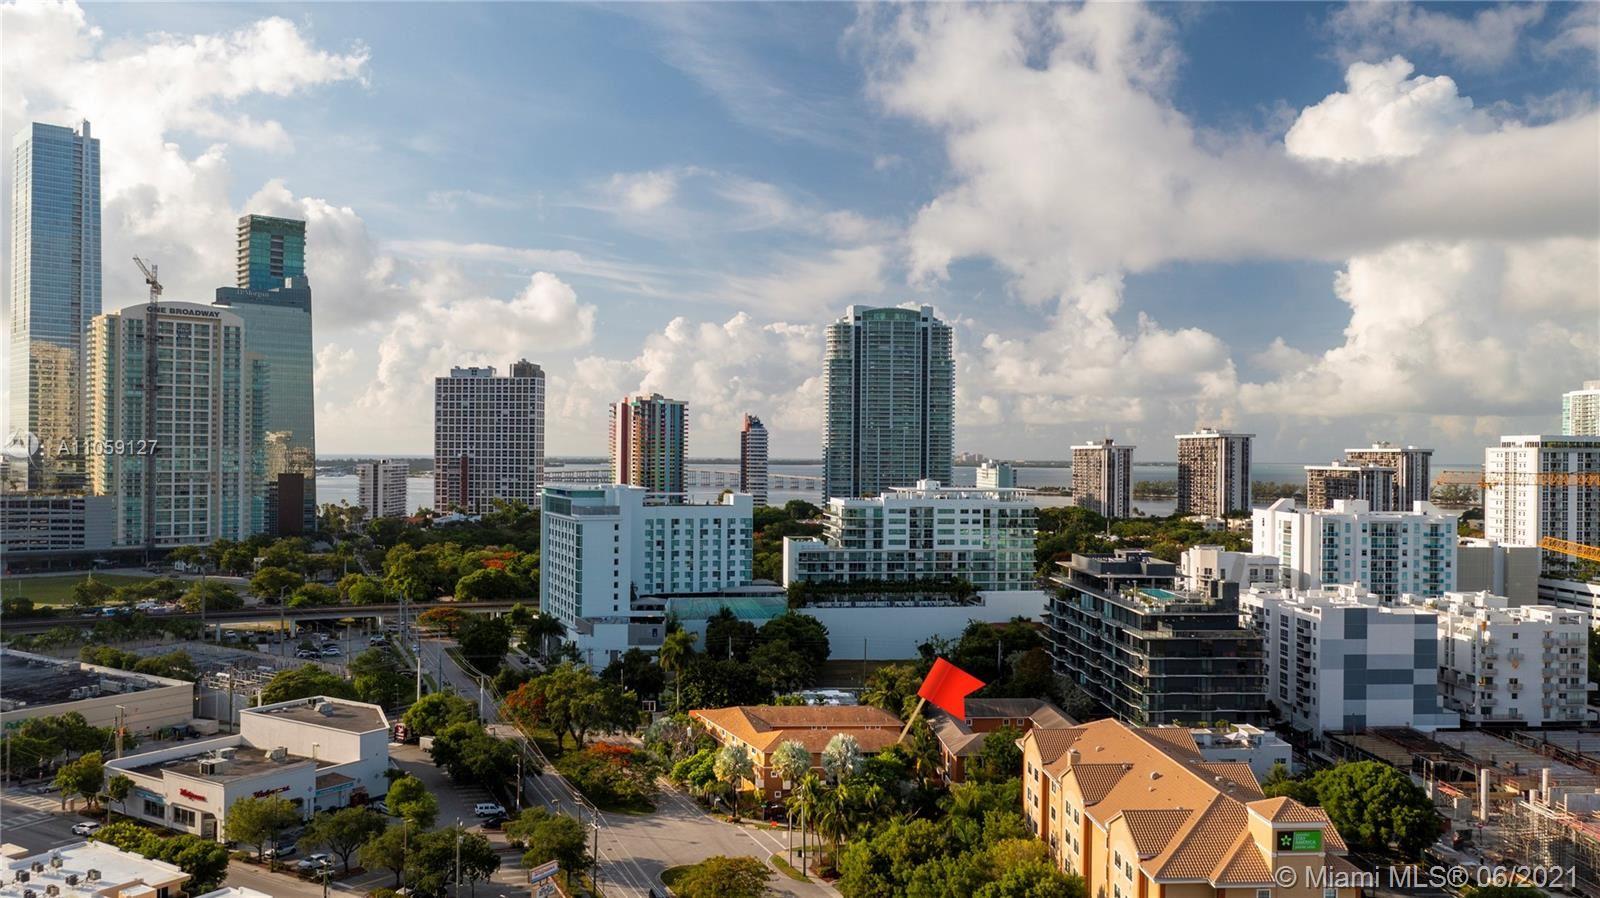 Photo of 240 SW 15th Rd #101, Miami, FL 33129 (MLS # A11059127)